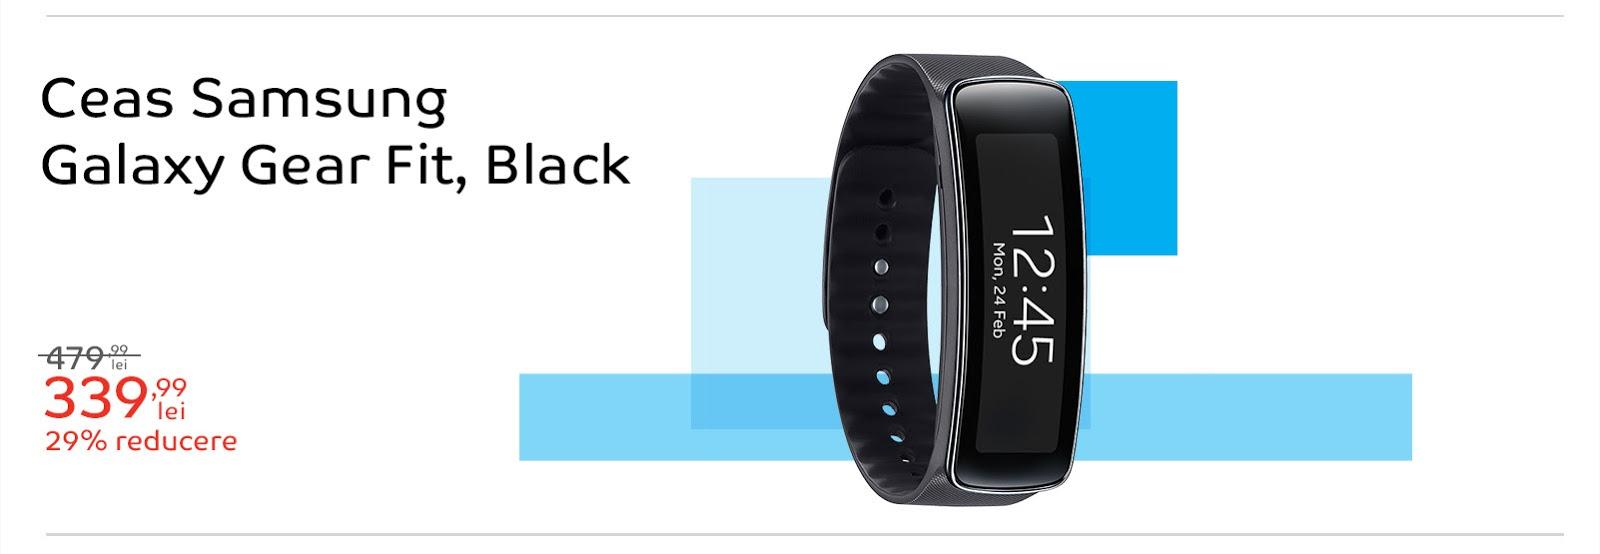 Samsung Gear Fit la reducere